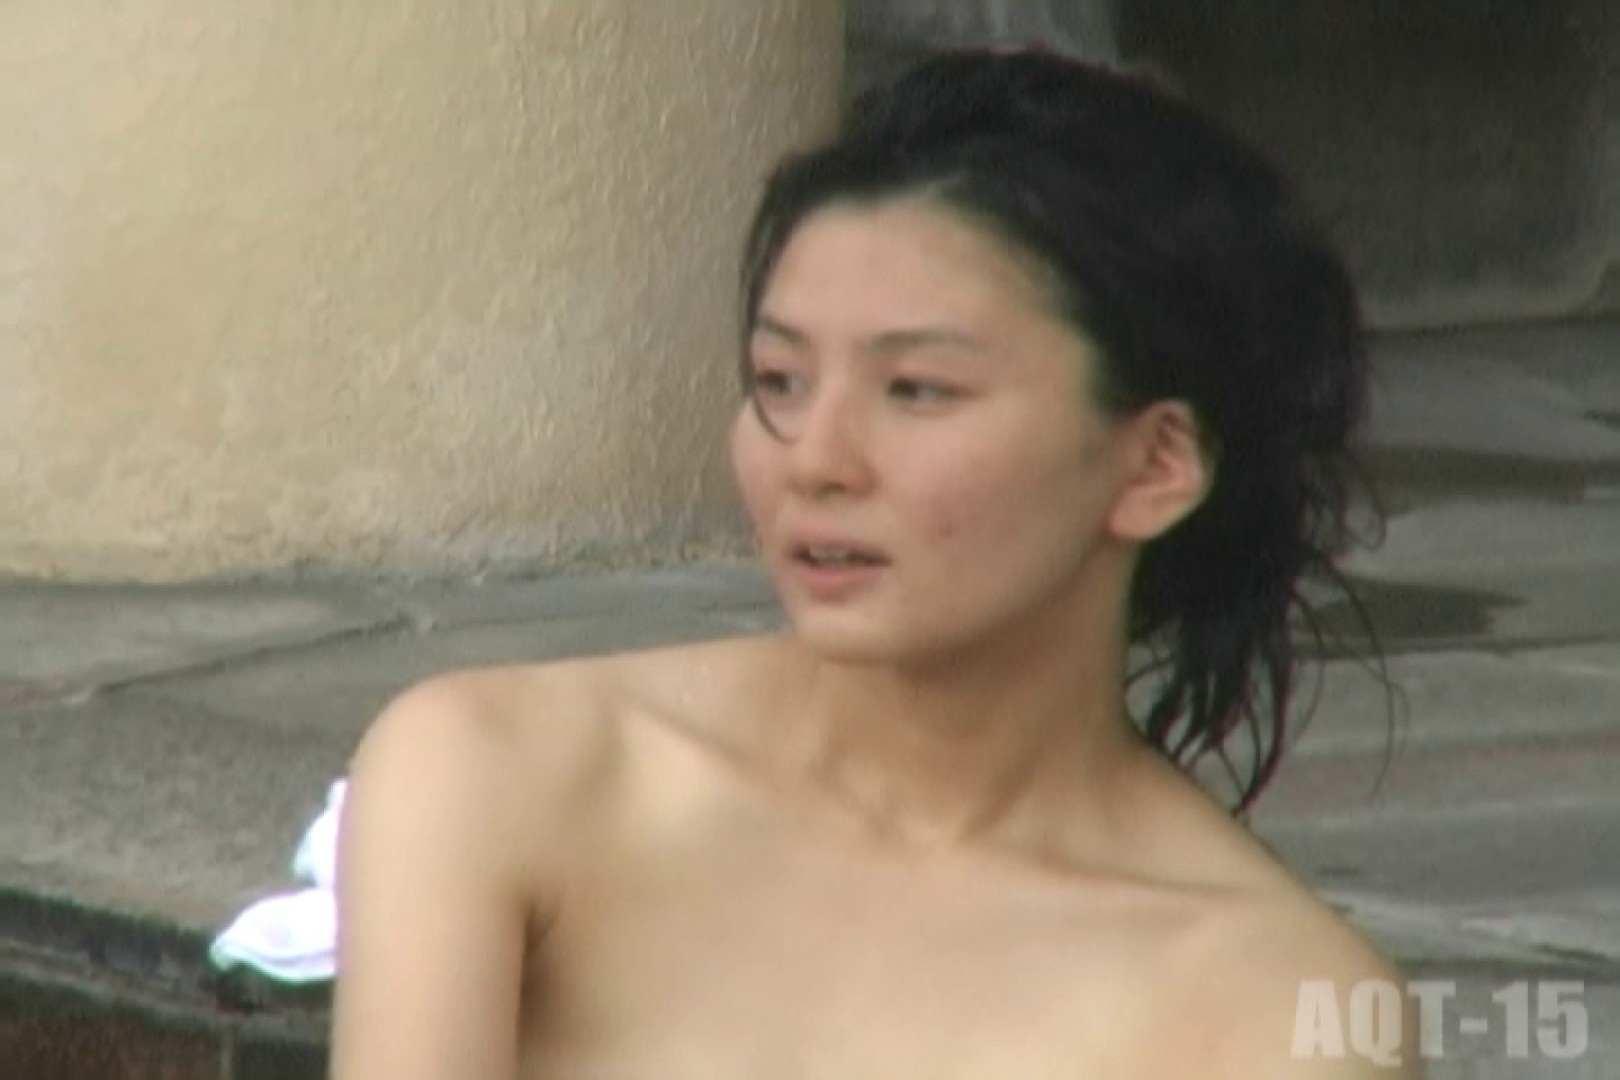 Aquaな露天風呂Vol.832 露天風呂編 | 盗撮シリーズ  108PIX 49